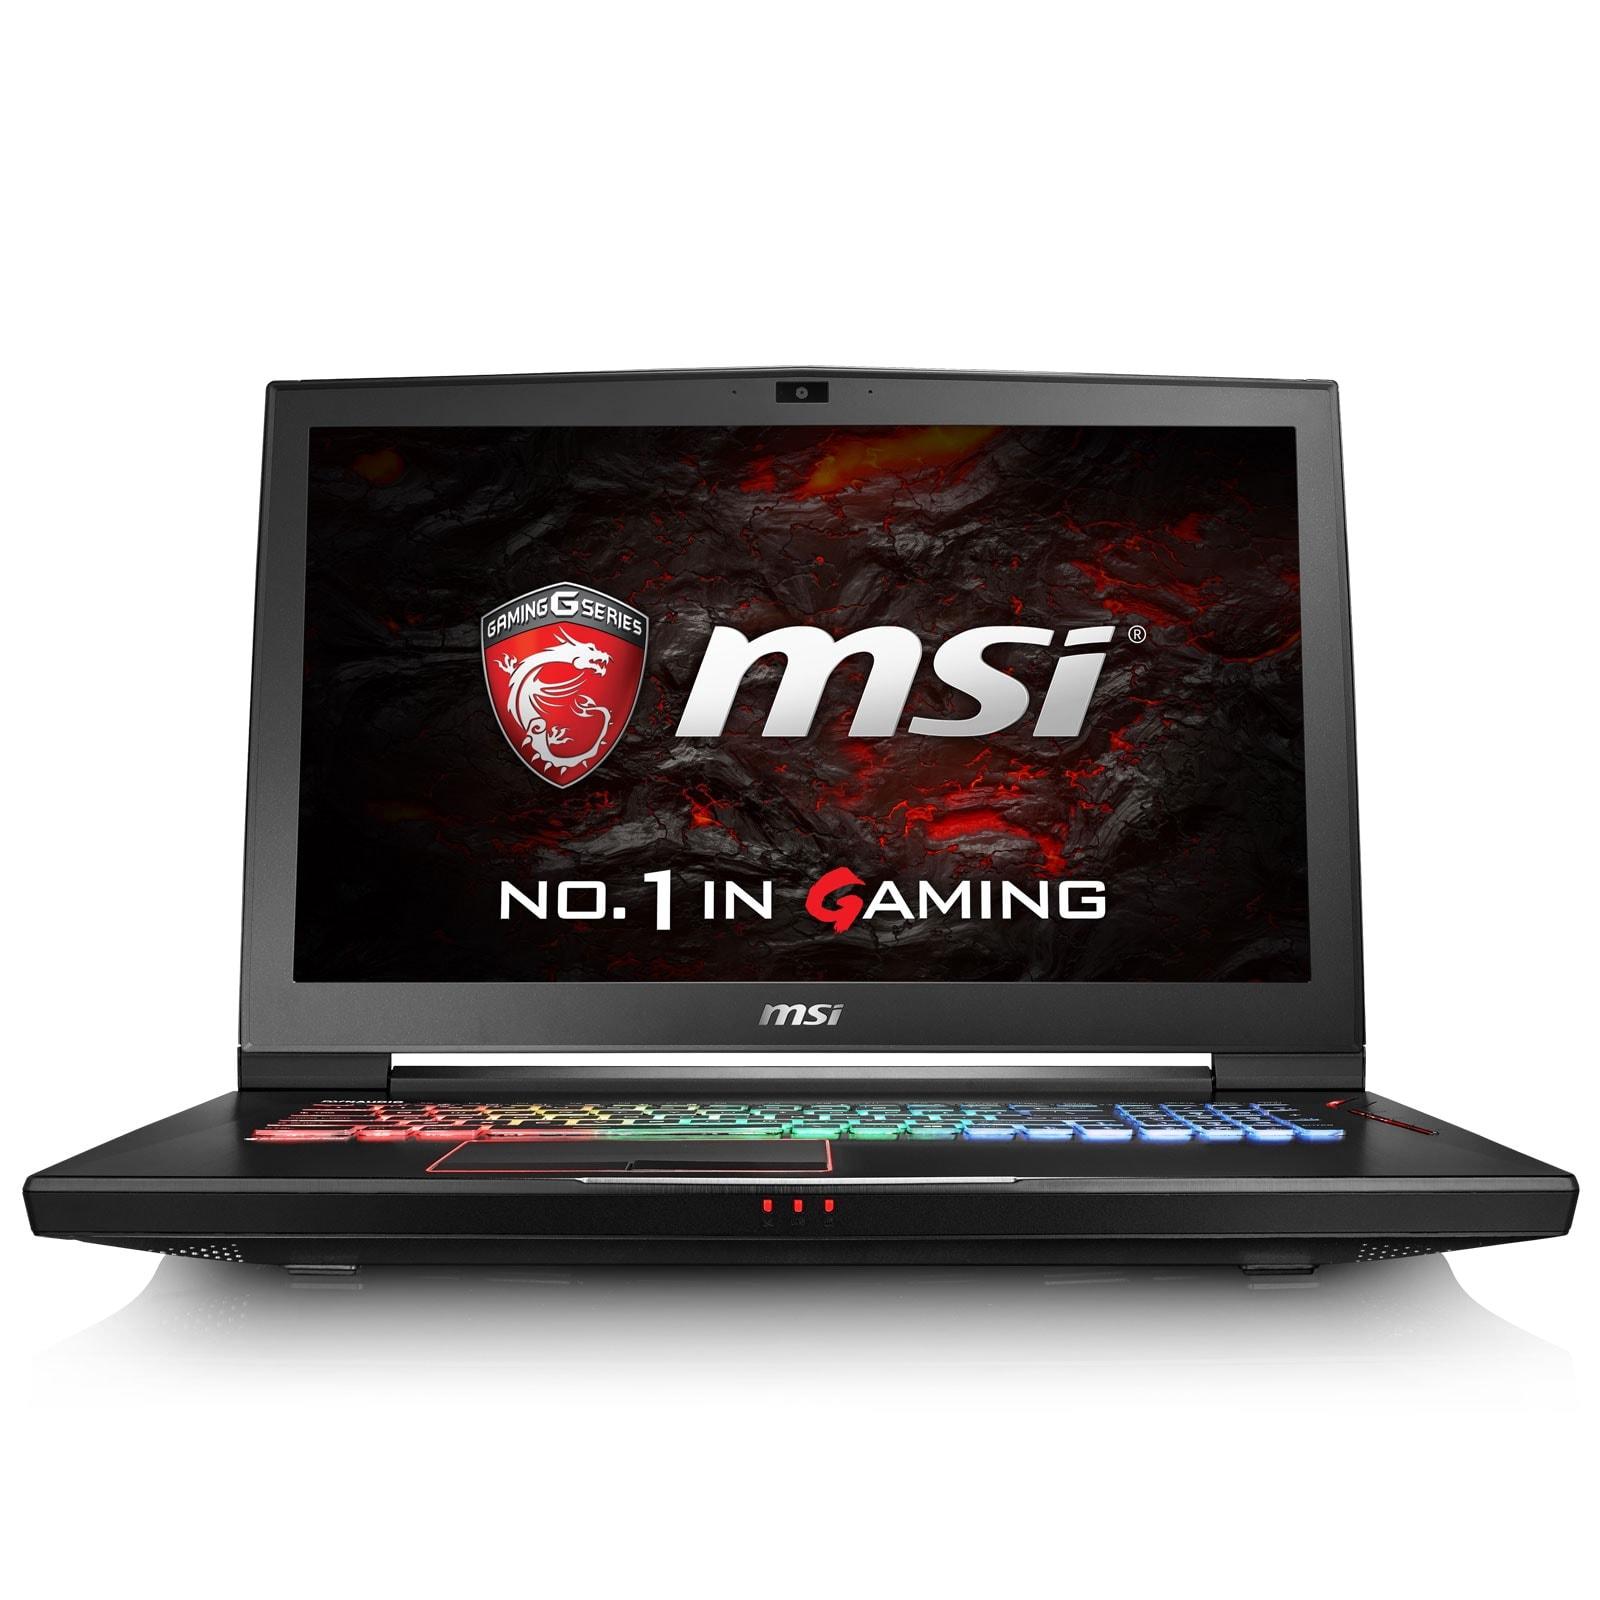 MSI GT73VR 6RF (Titan Pro)-075FR (9S7-17A111-075) - Achat / Vente PC portable sur Cybertek.fr - 2